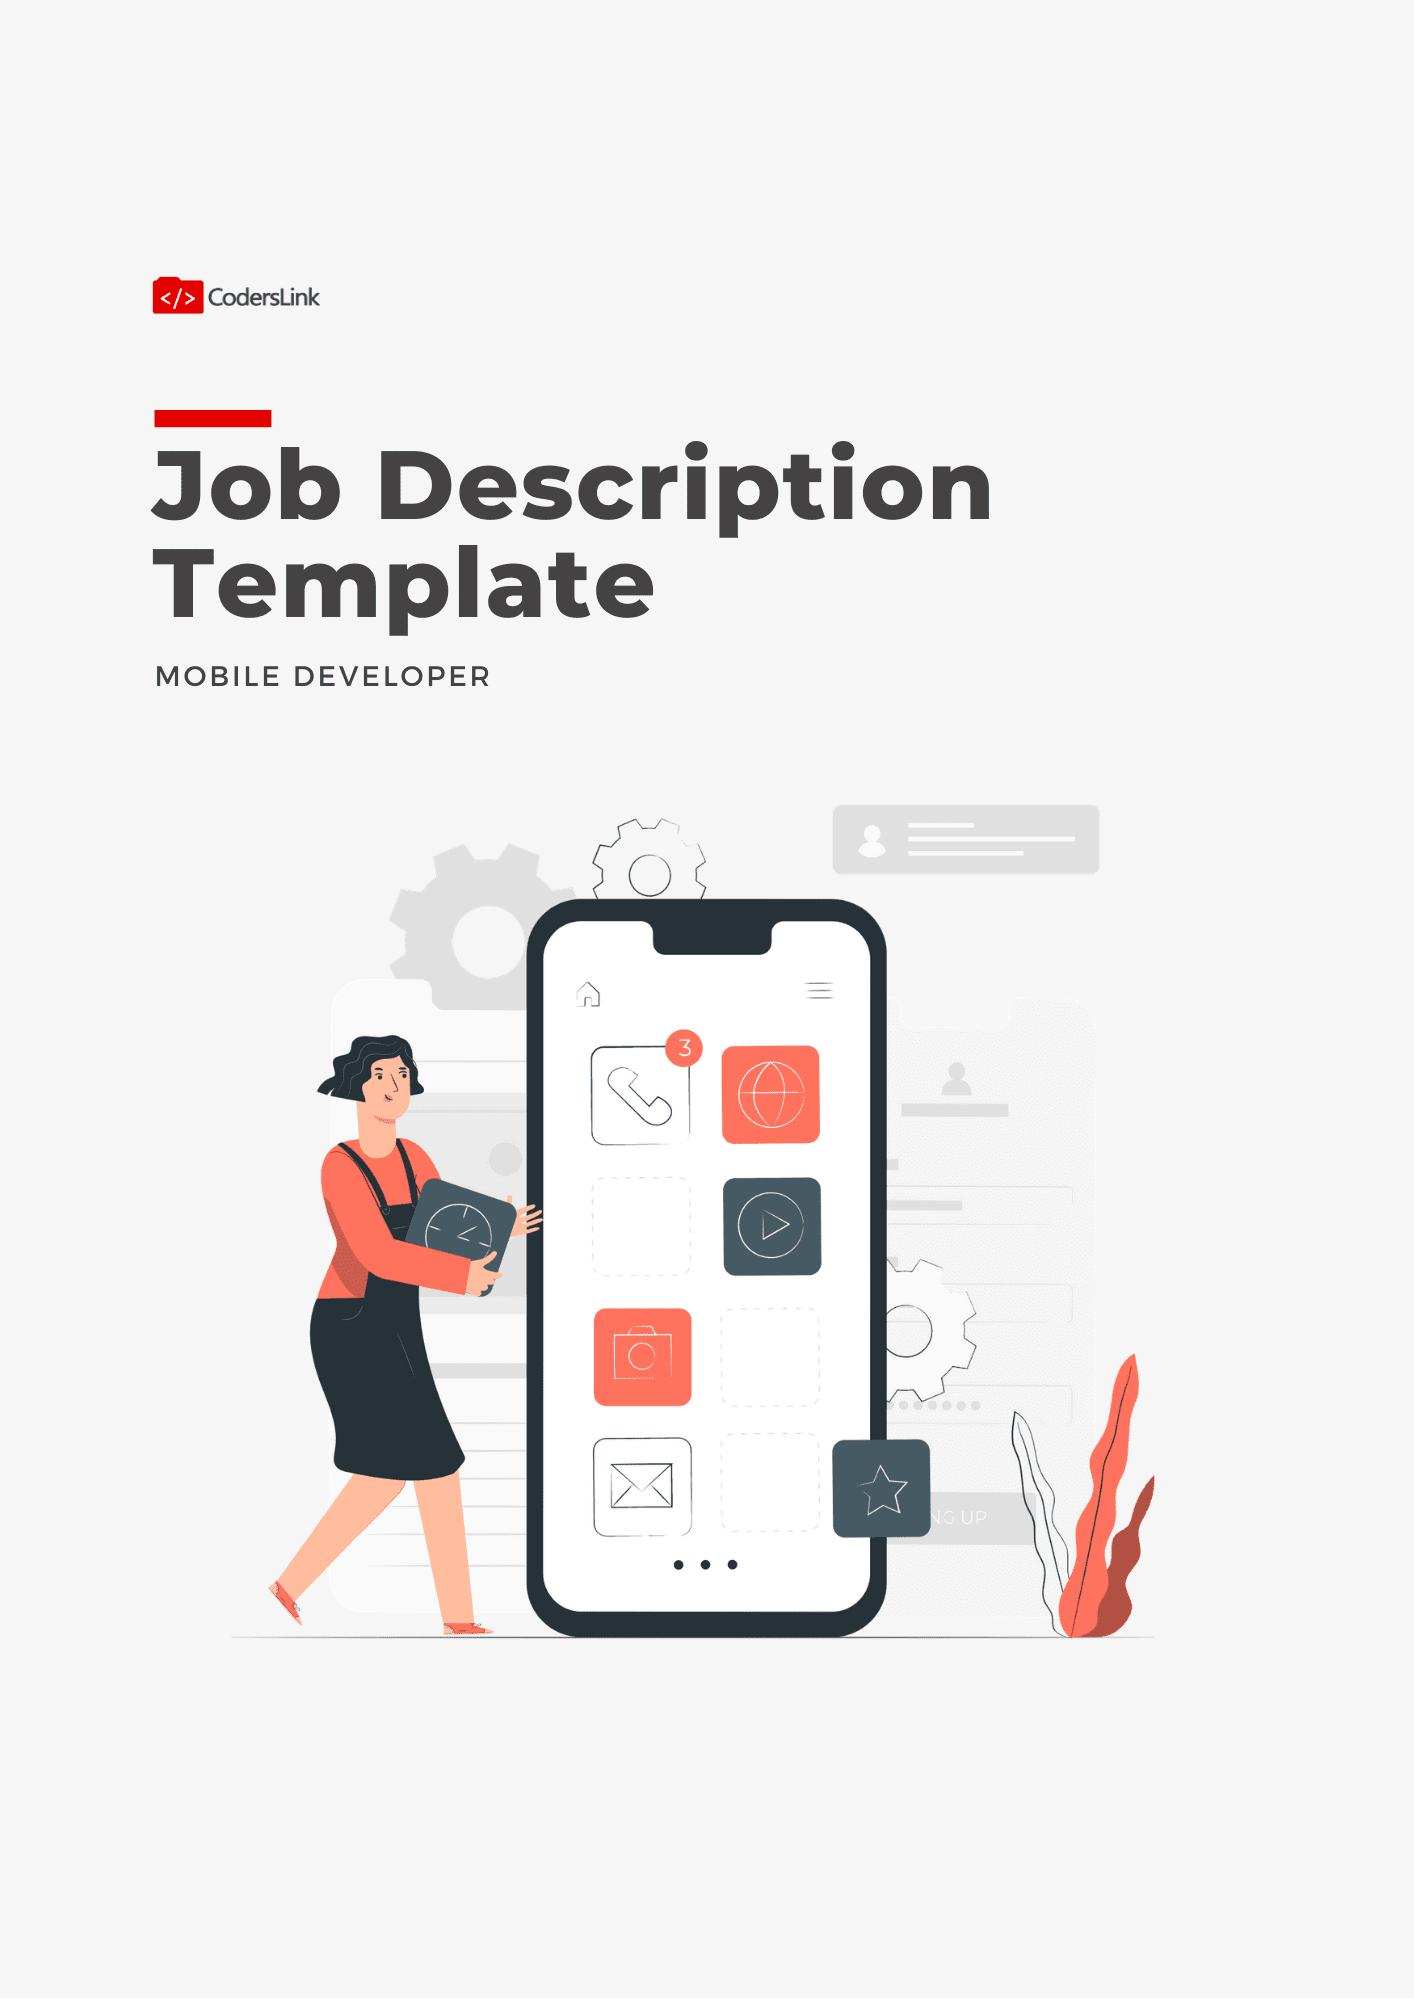 mobile developer job description template